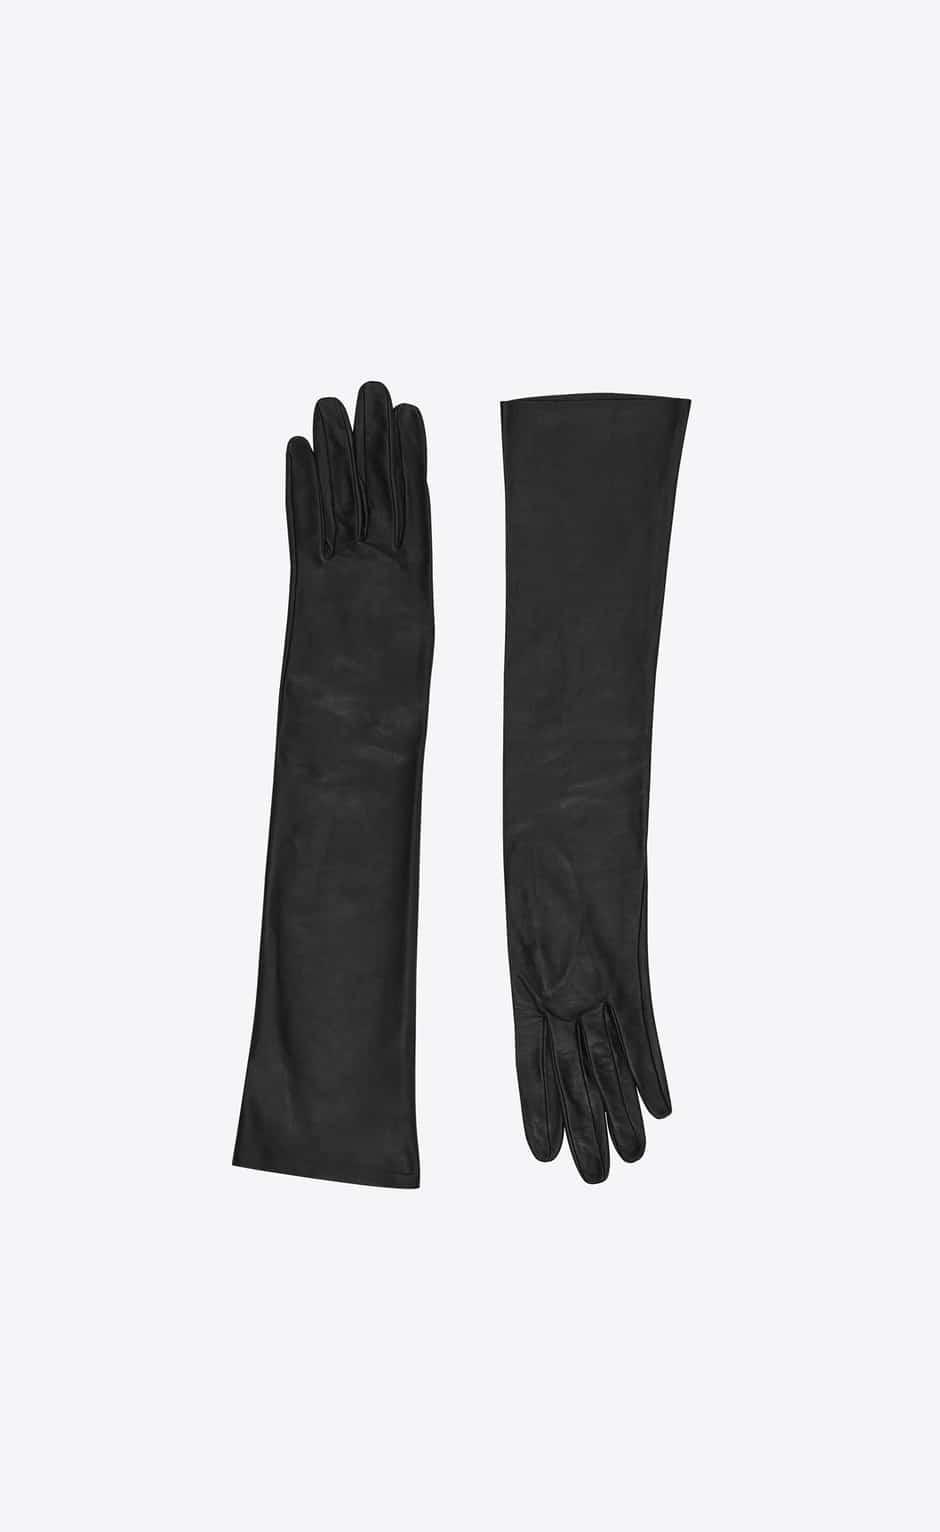 gants yves saint laurent luxe cuir noir